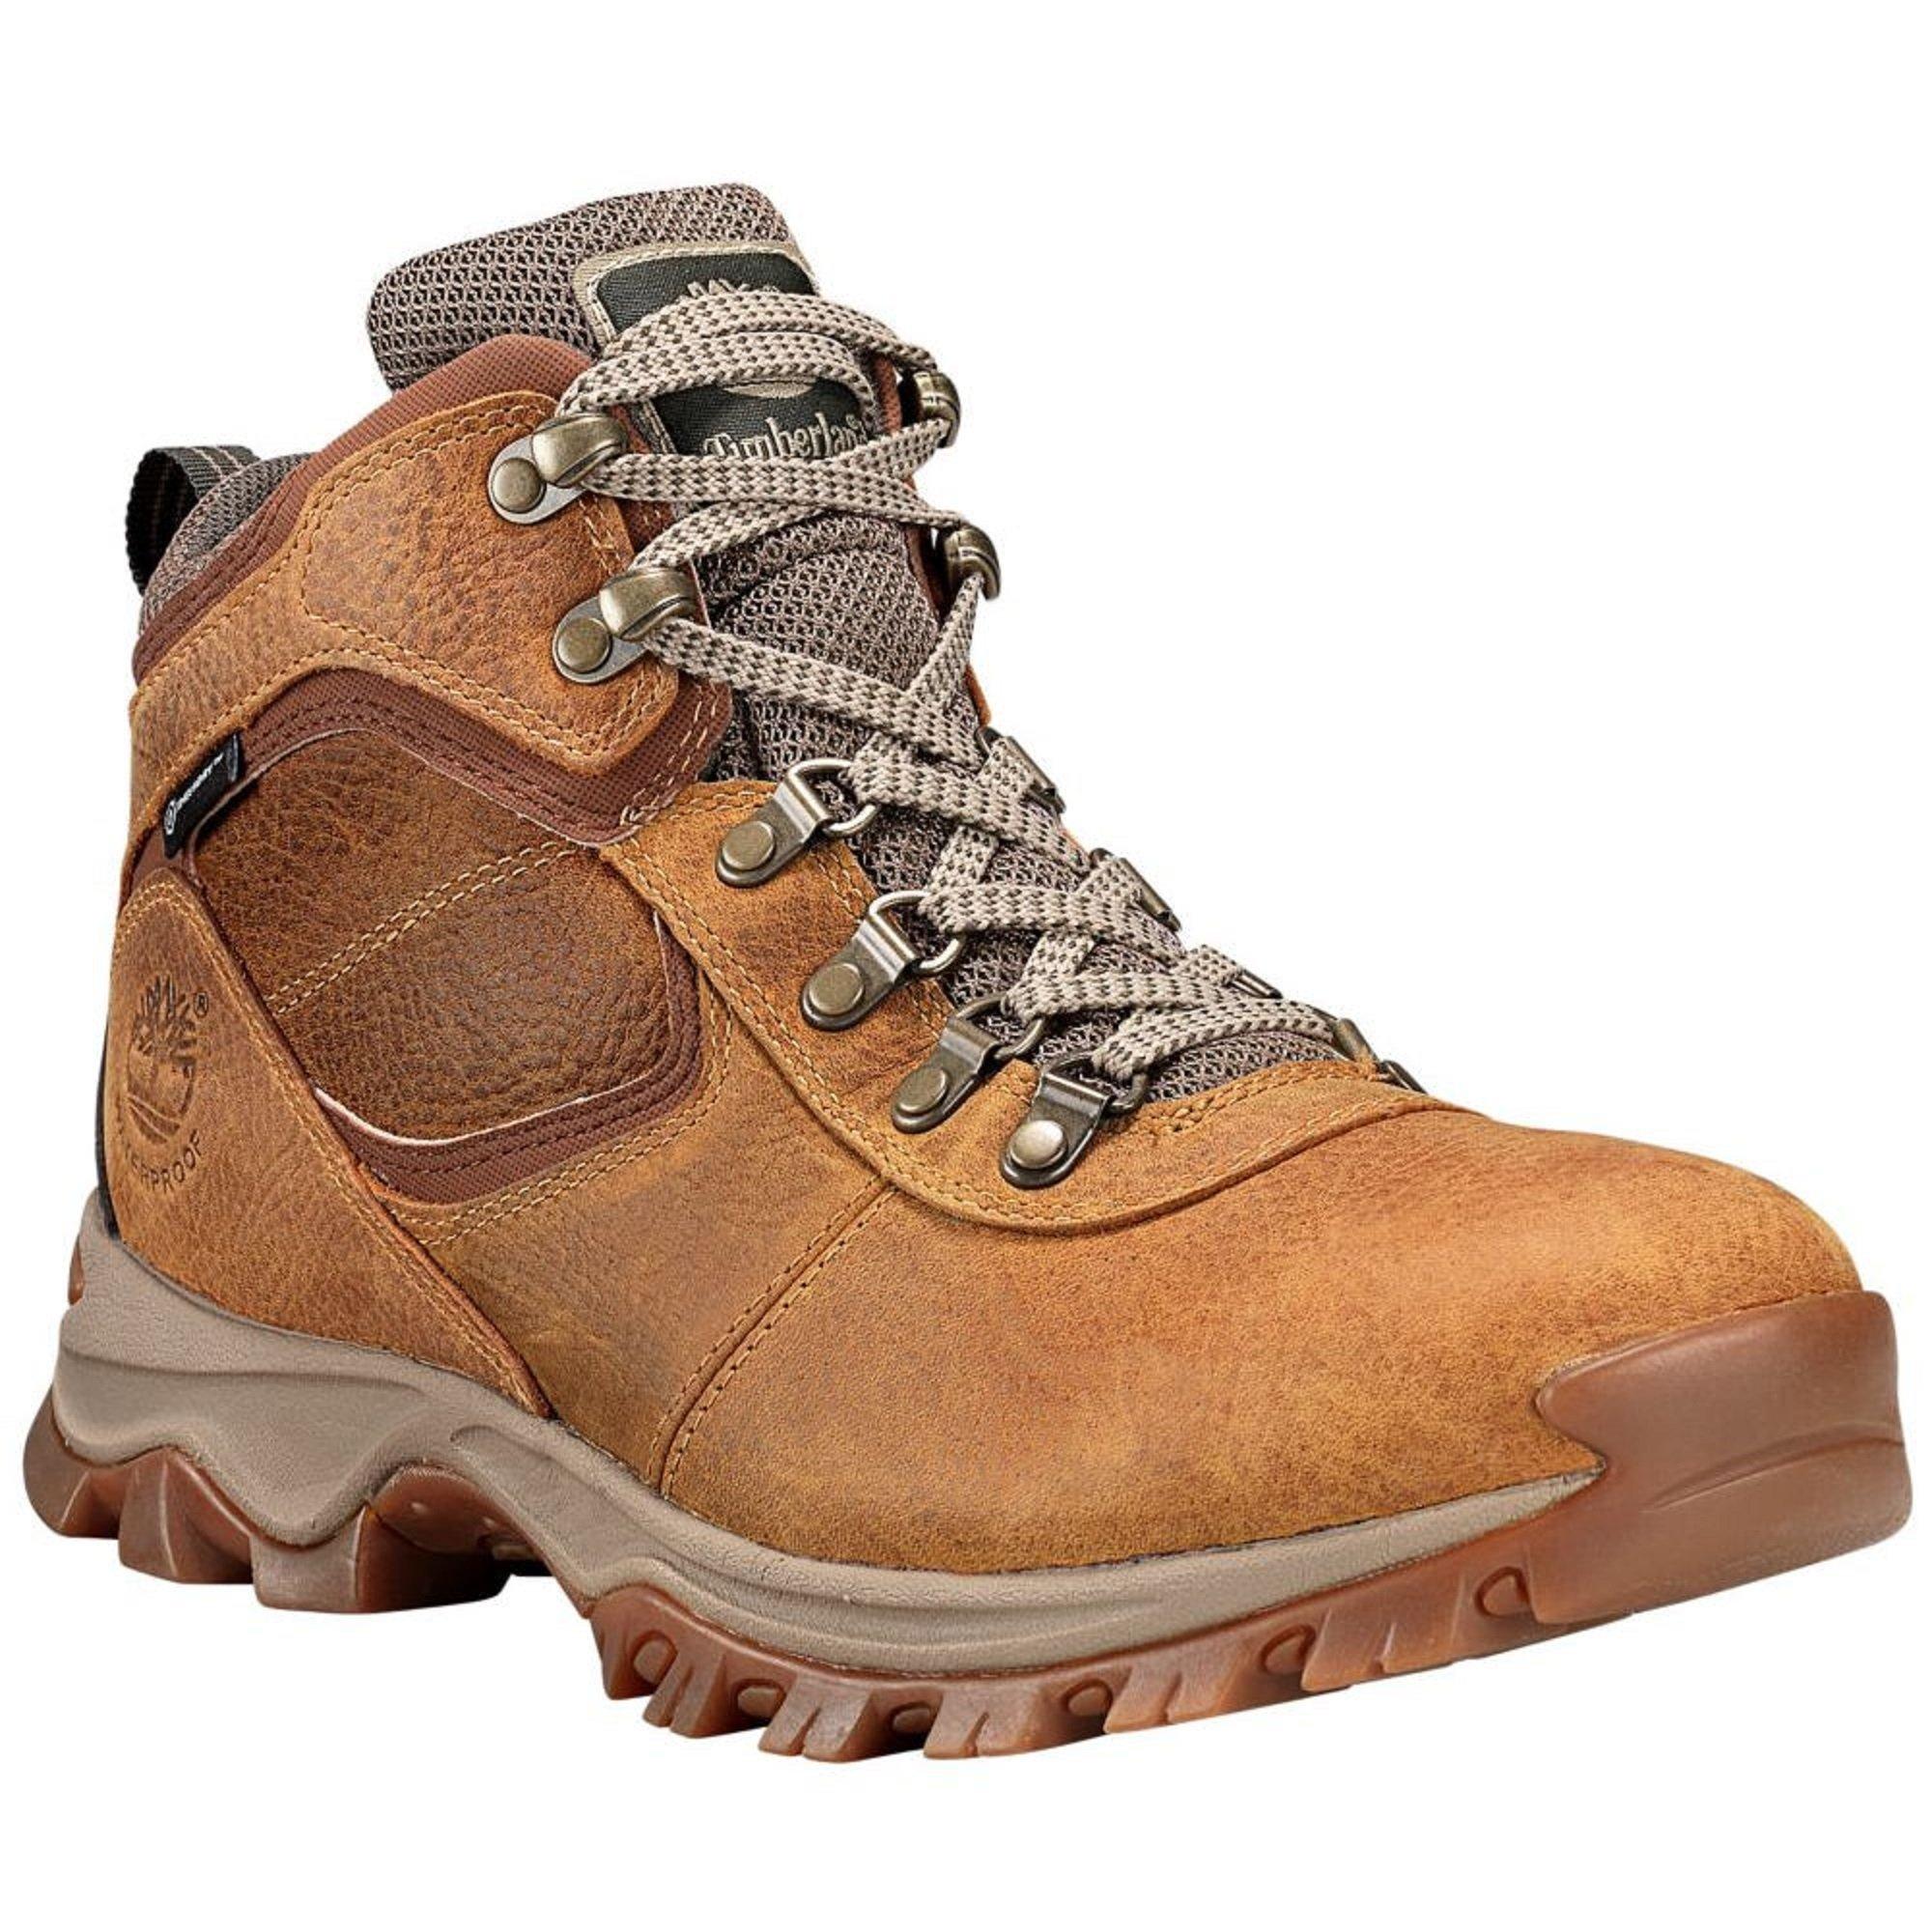 Timberland Mt. Maddsen Mid Waterproof Hiking Boot - Men's Light Brown Full Grain, 10.0 by Timberland